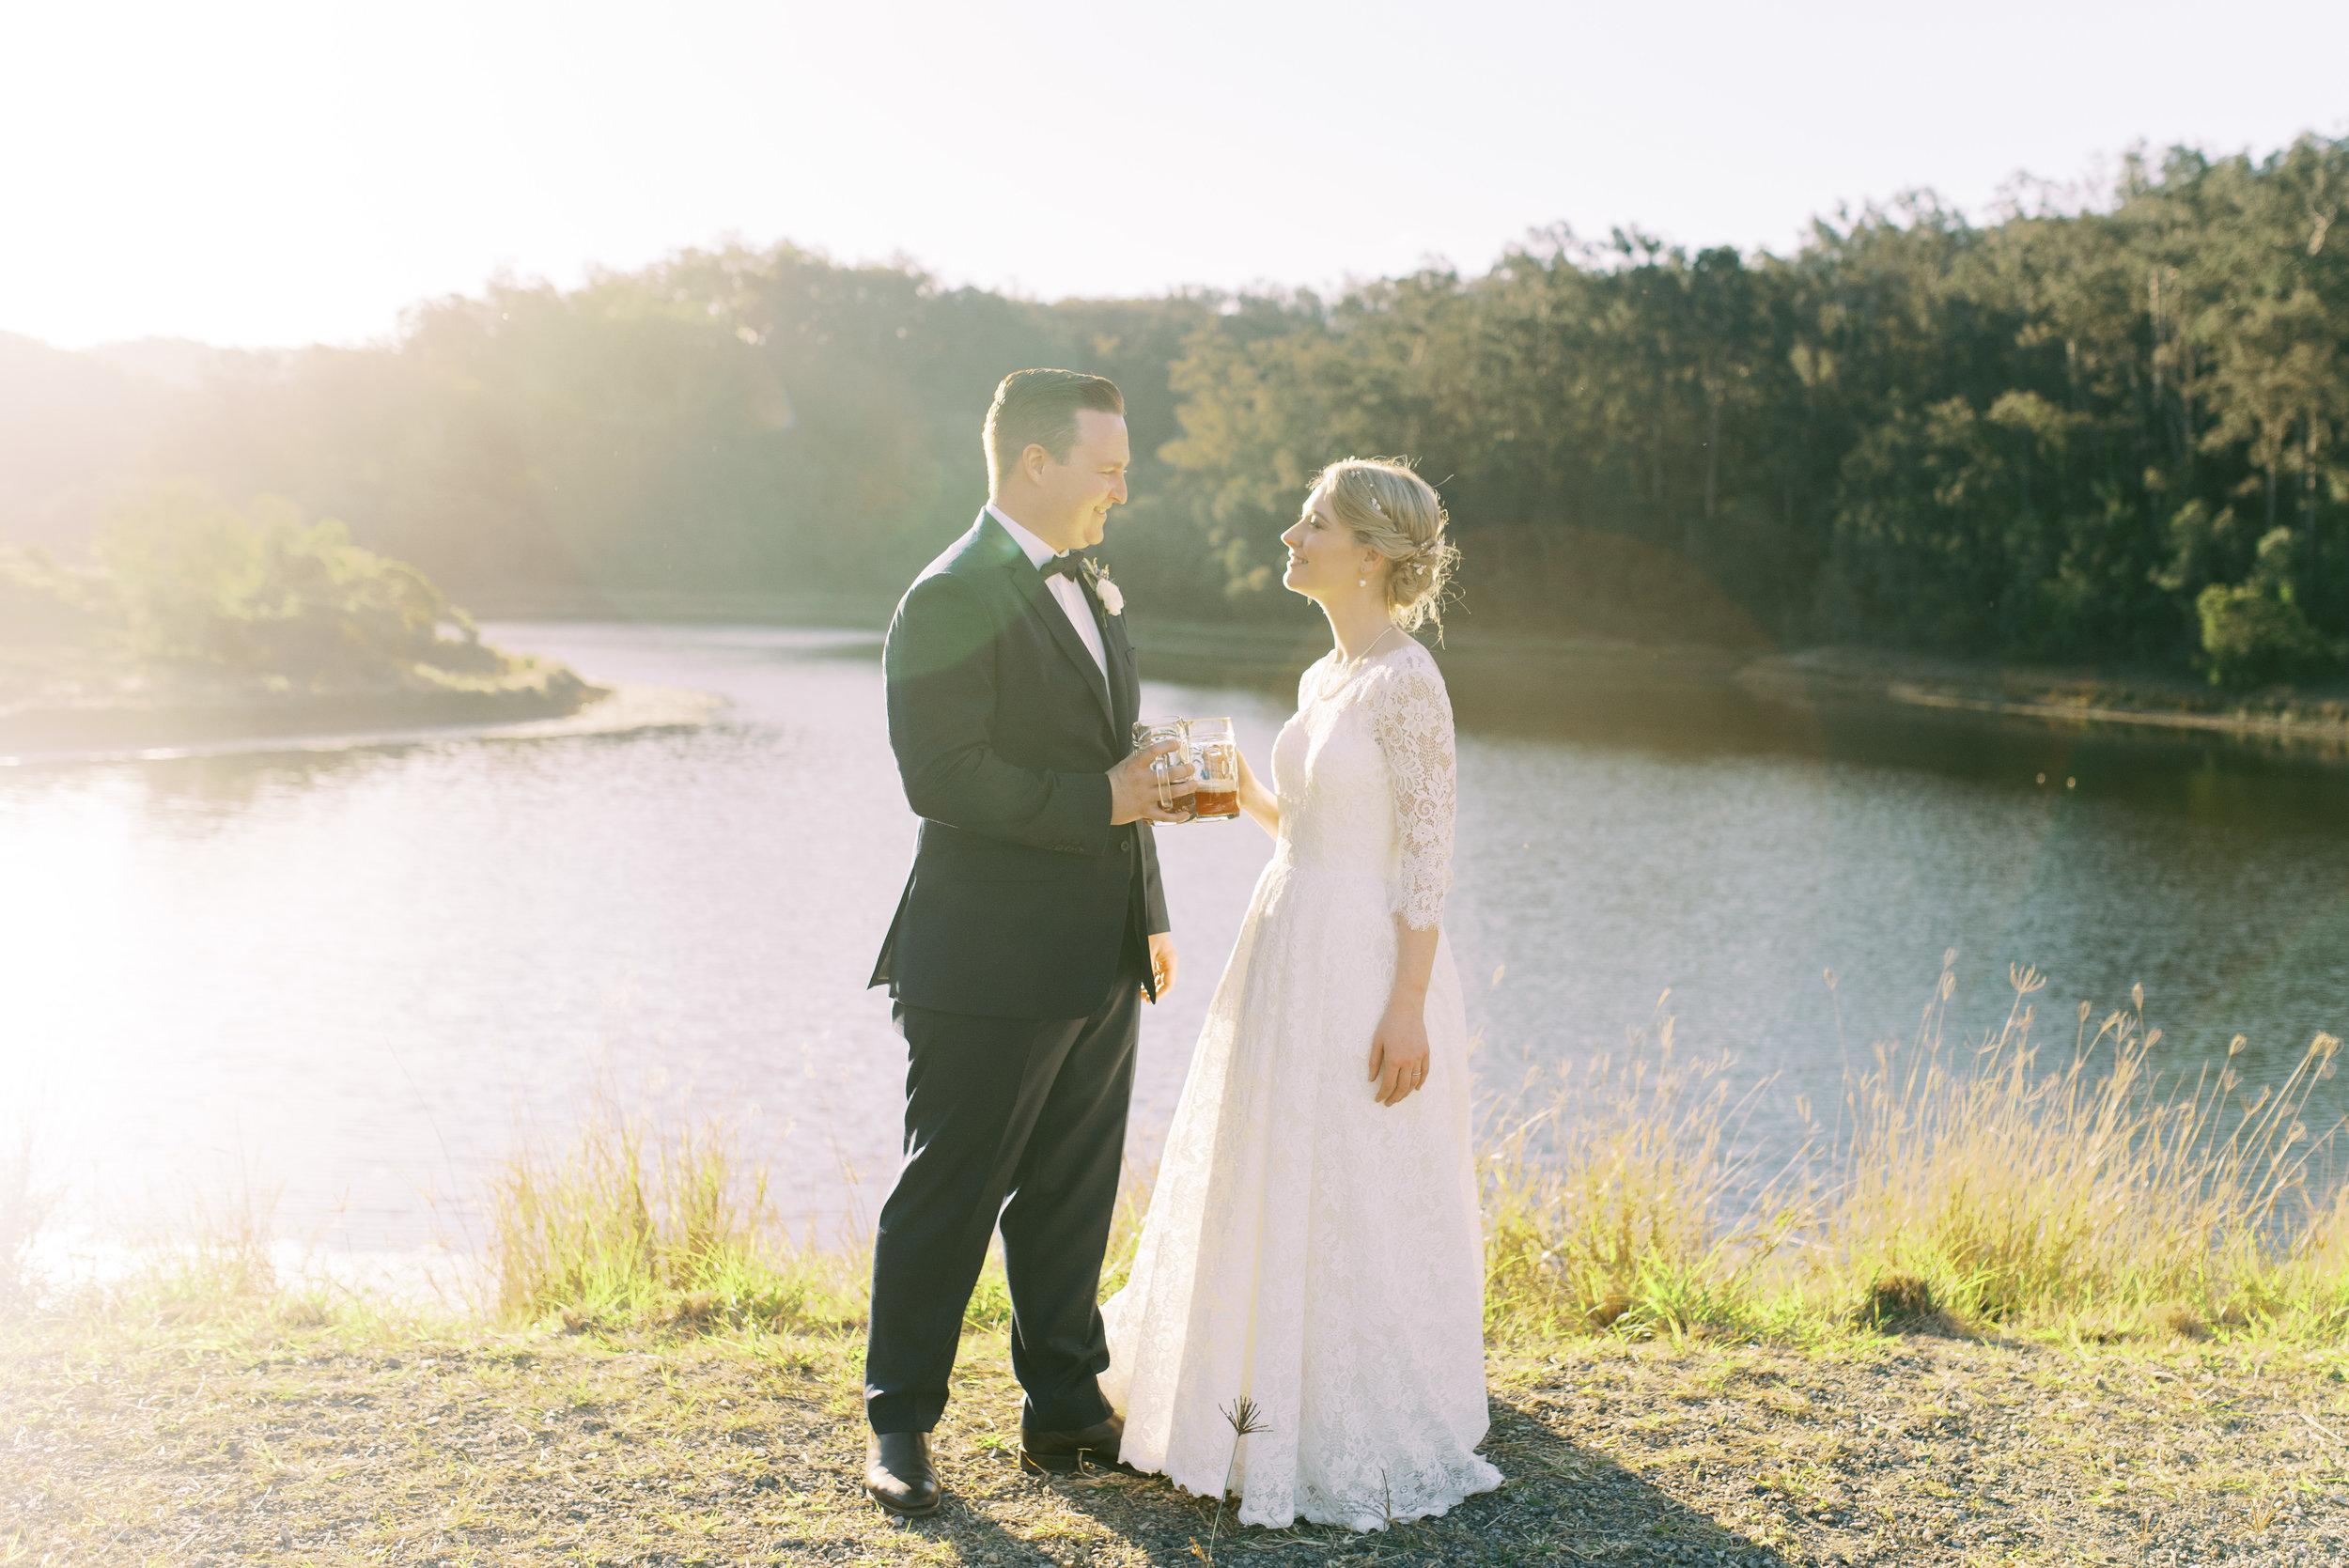 brisbane-gold-coast-sunshine-coast-tweed-romantic-fine-art-wedding-photography-lauren-olivia-44.jpg